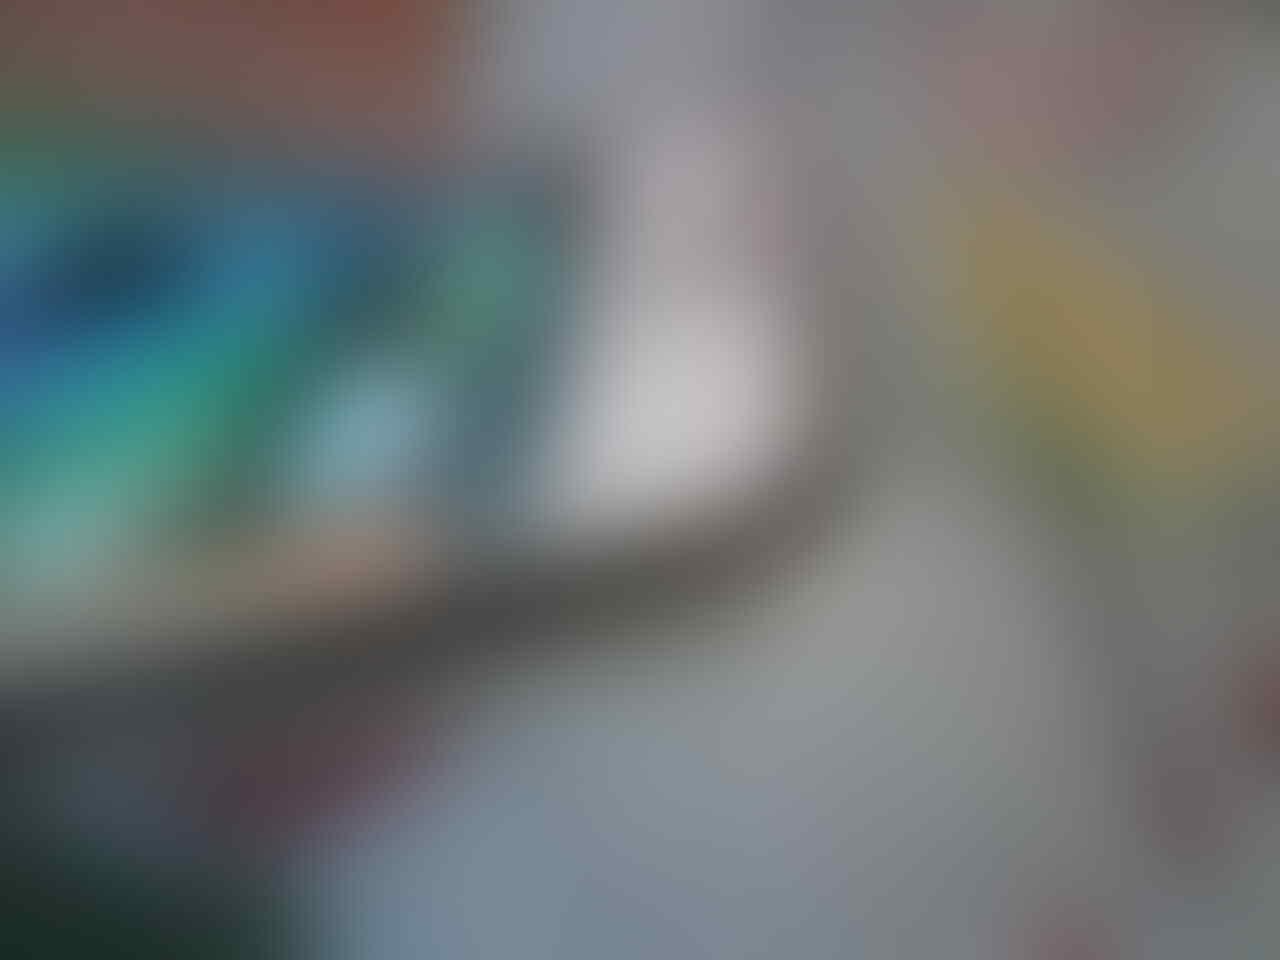 Samsung Galaxy S2 I9100 WHITE